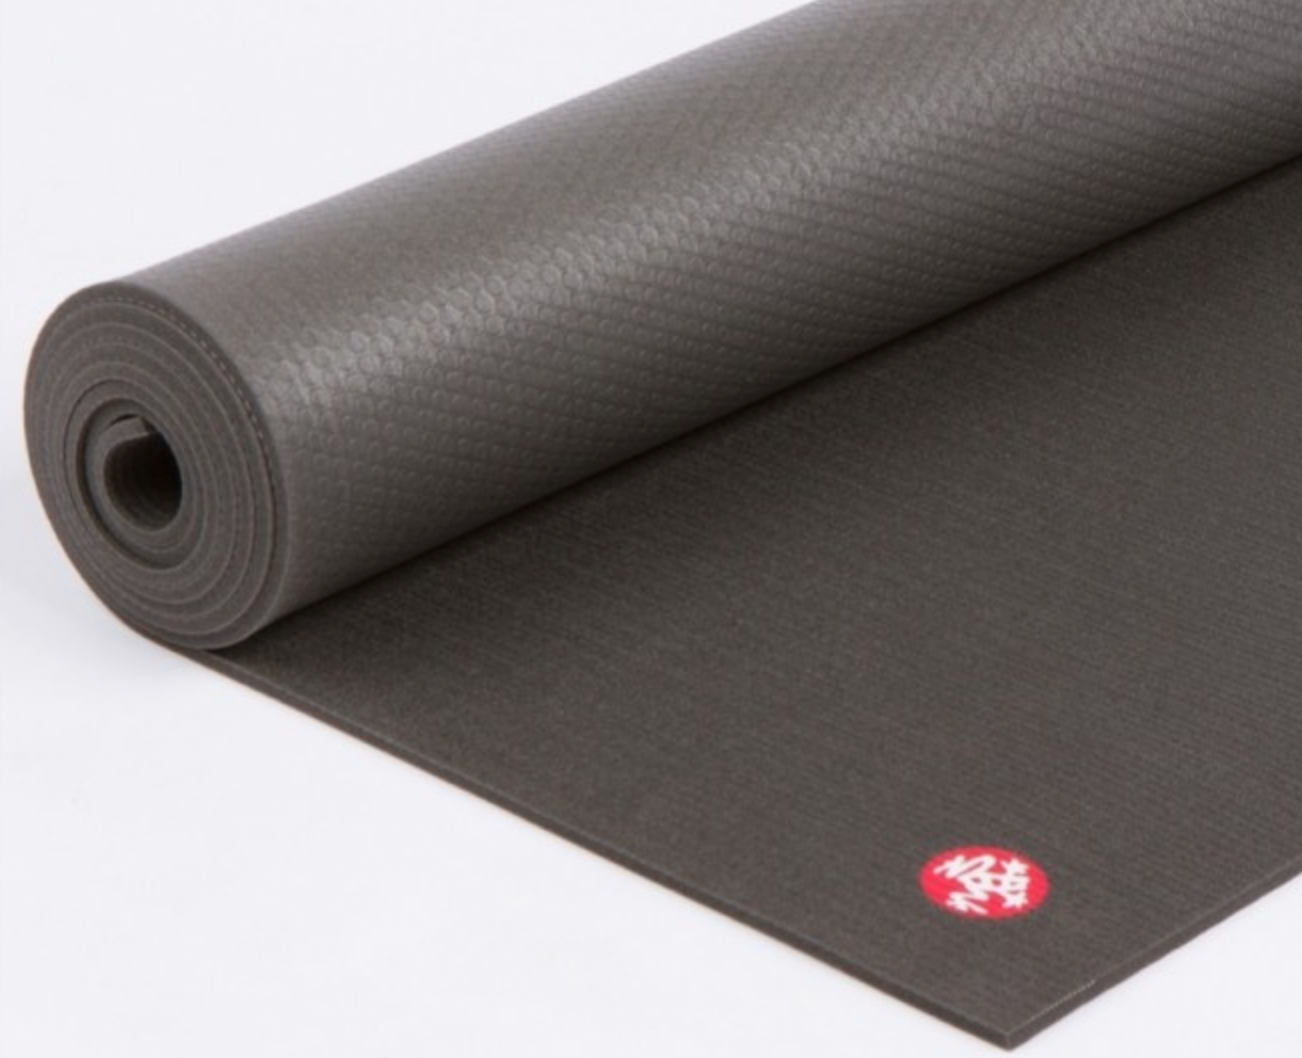 manduka yoga mat review